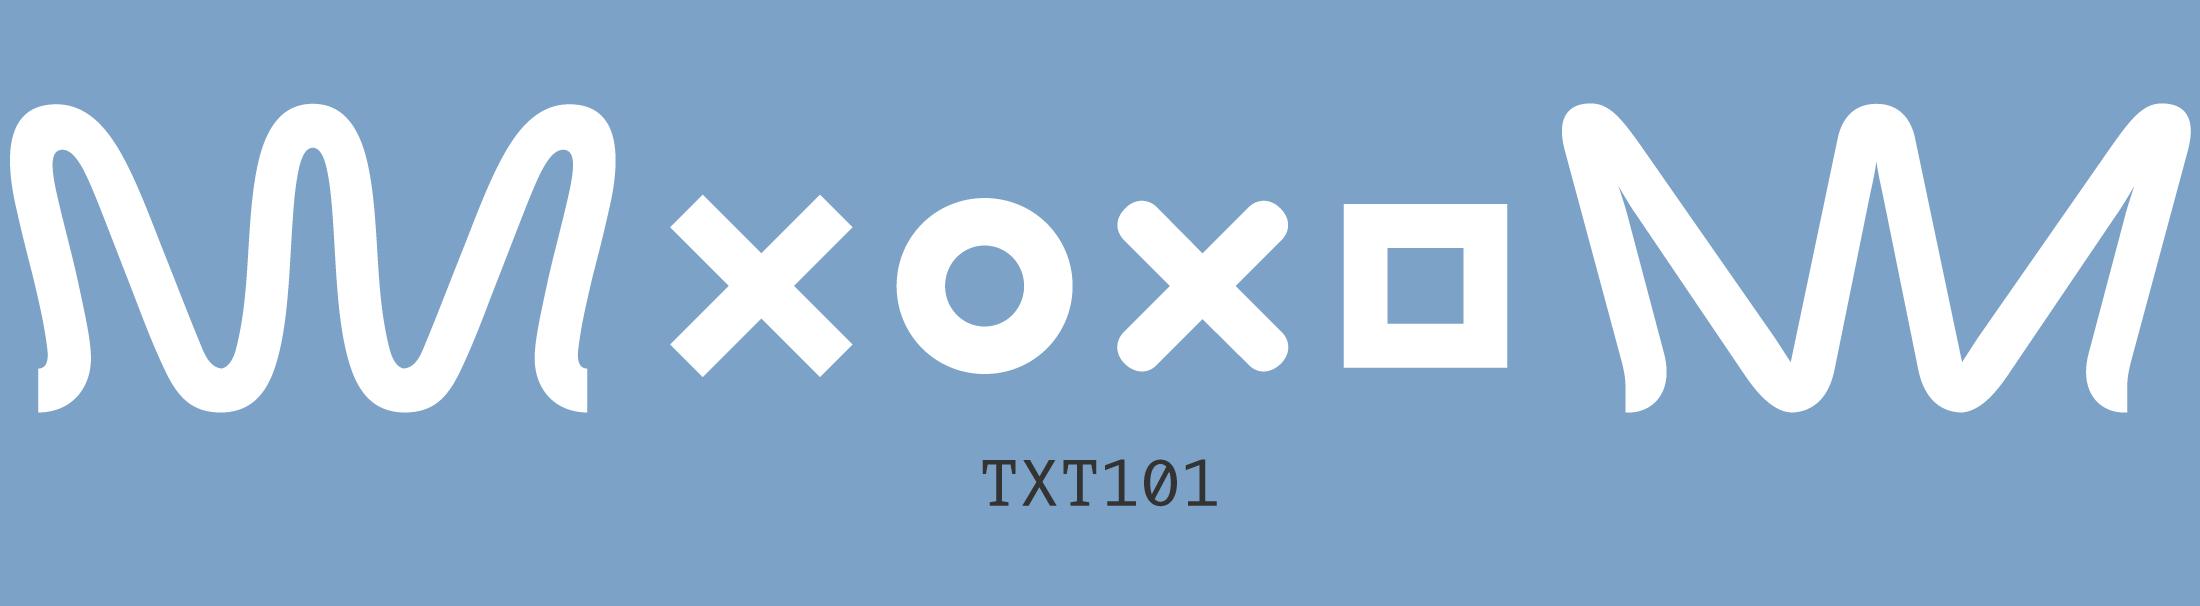 TXT101 PSYOPS Banner